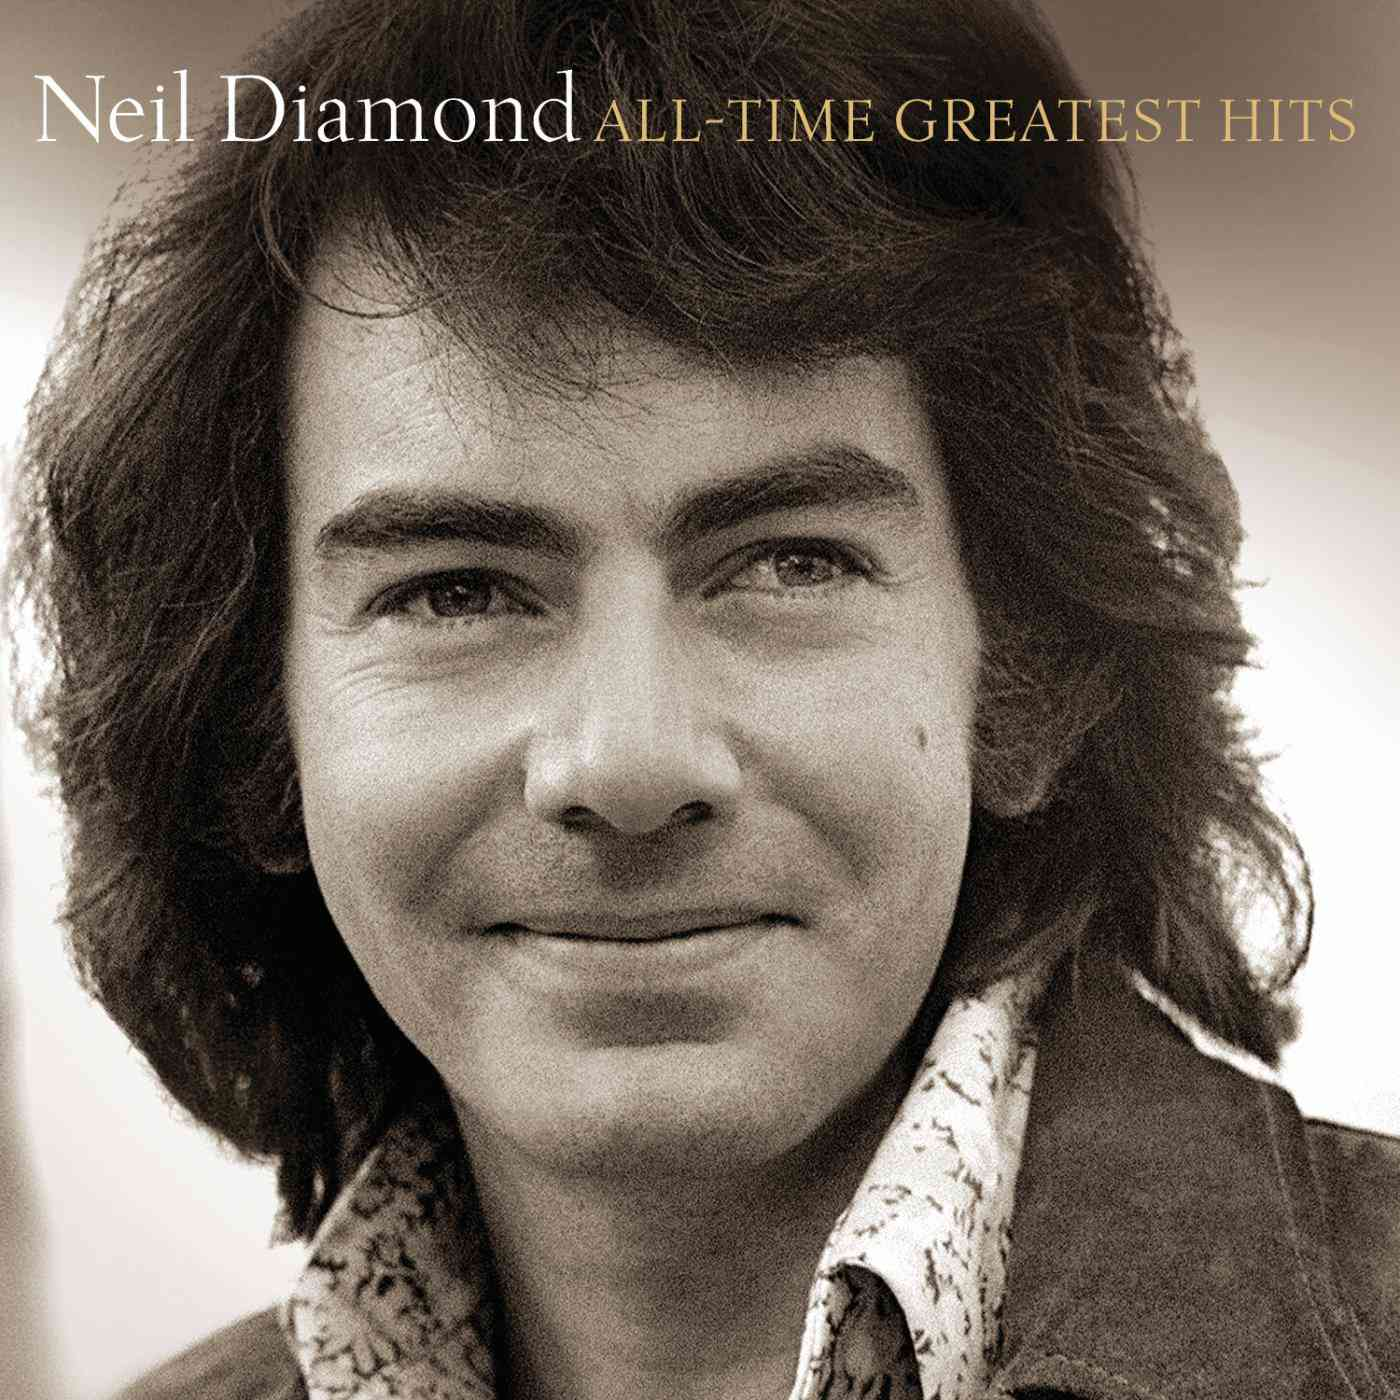 Neil Diamond's All-Time Greatest Hits Album